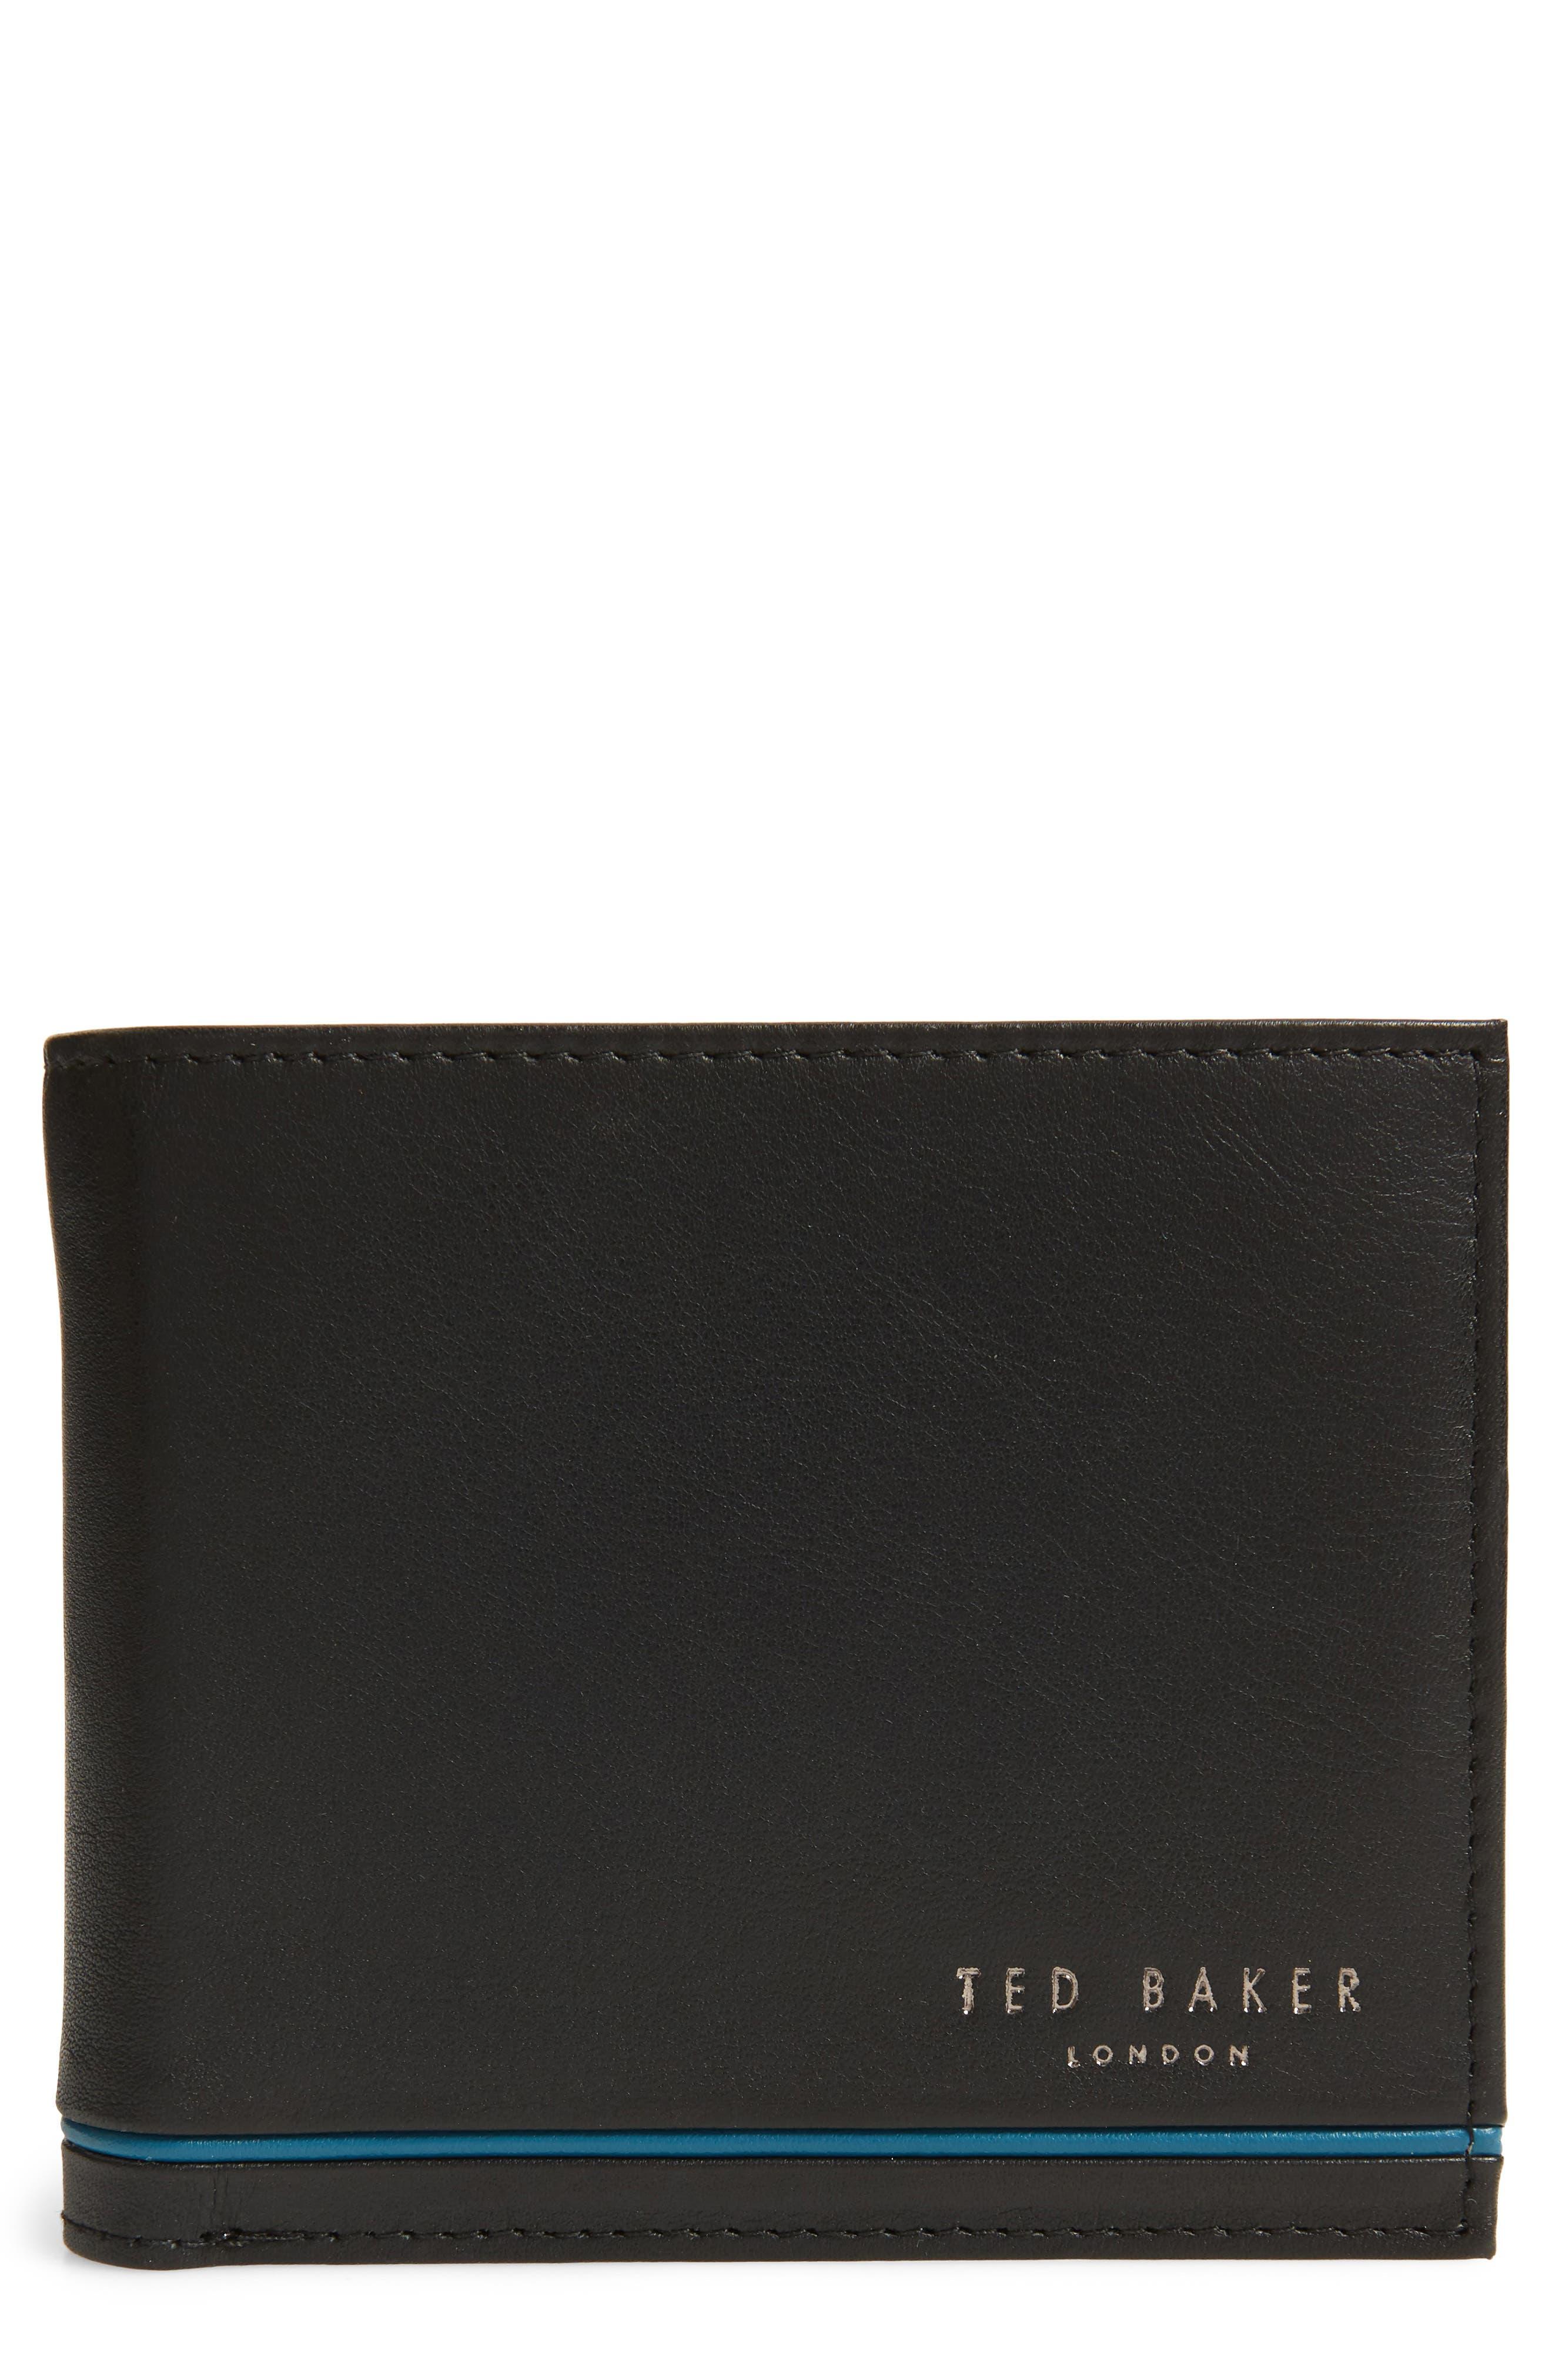 Dooree Leather Wallet,                         Main,                         color, BLACK